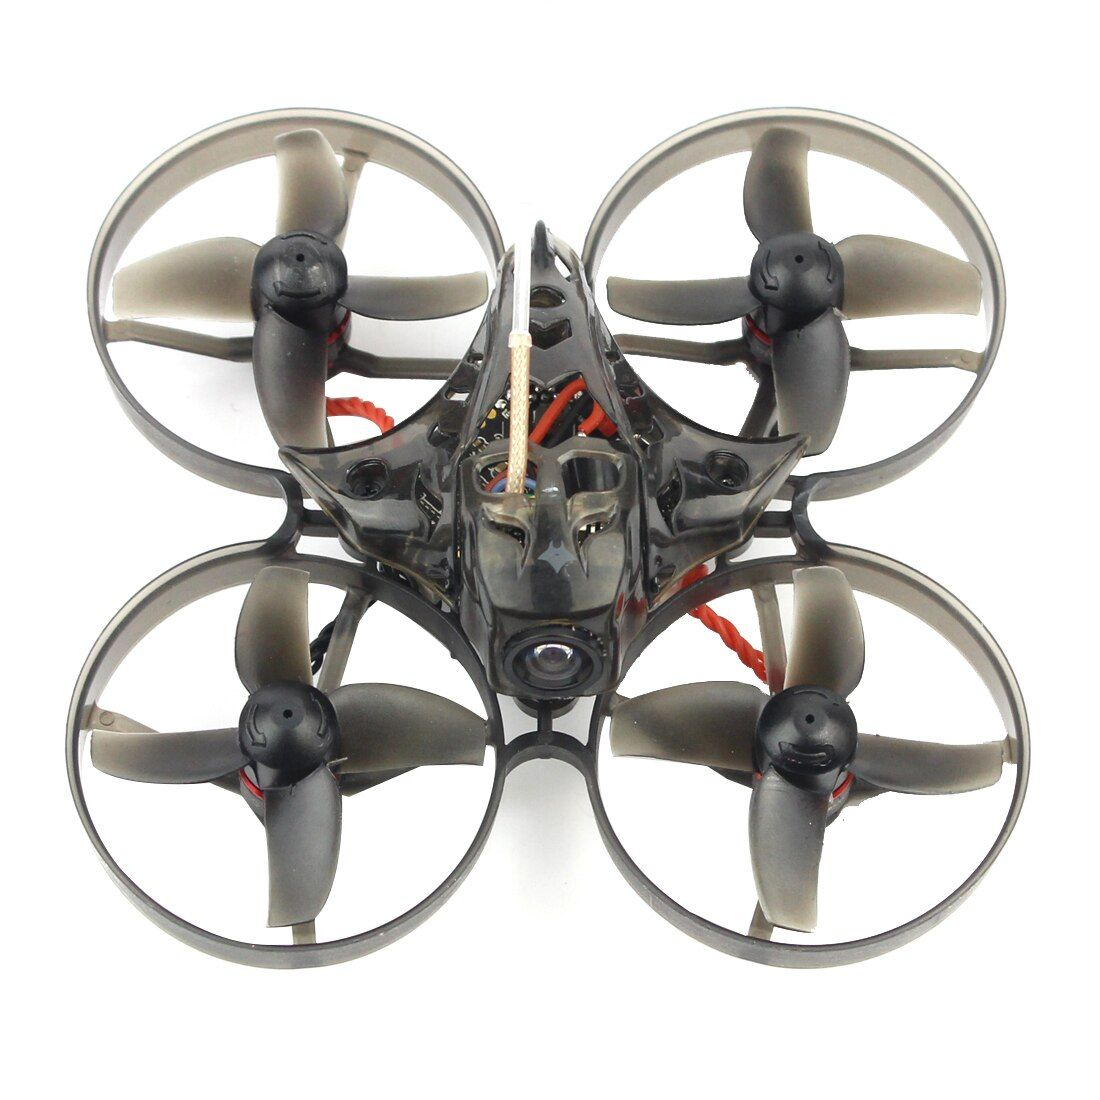 Mini Mobula7 75mm Crazybee F3 Pro OSD 2S RC FPV Racing Drone Quadcopter w/ Upgrade BB2 ESC 700TVL BNF Compatible Frsky Flysky